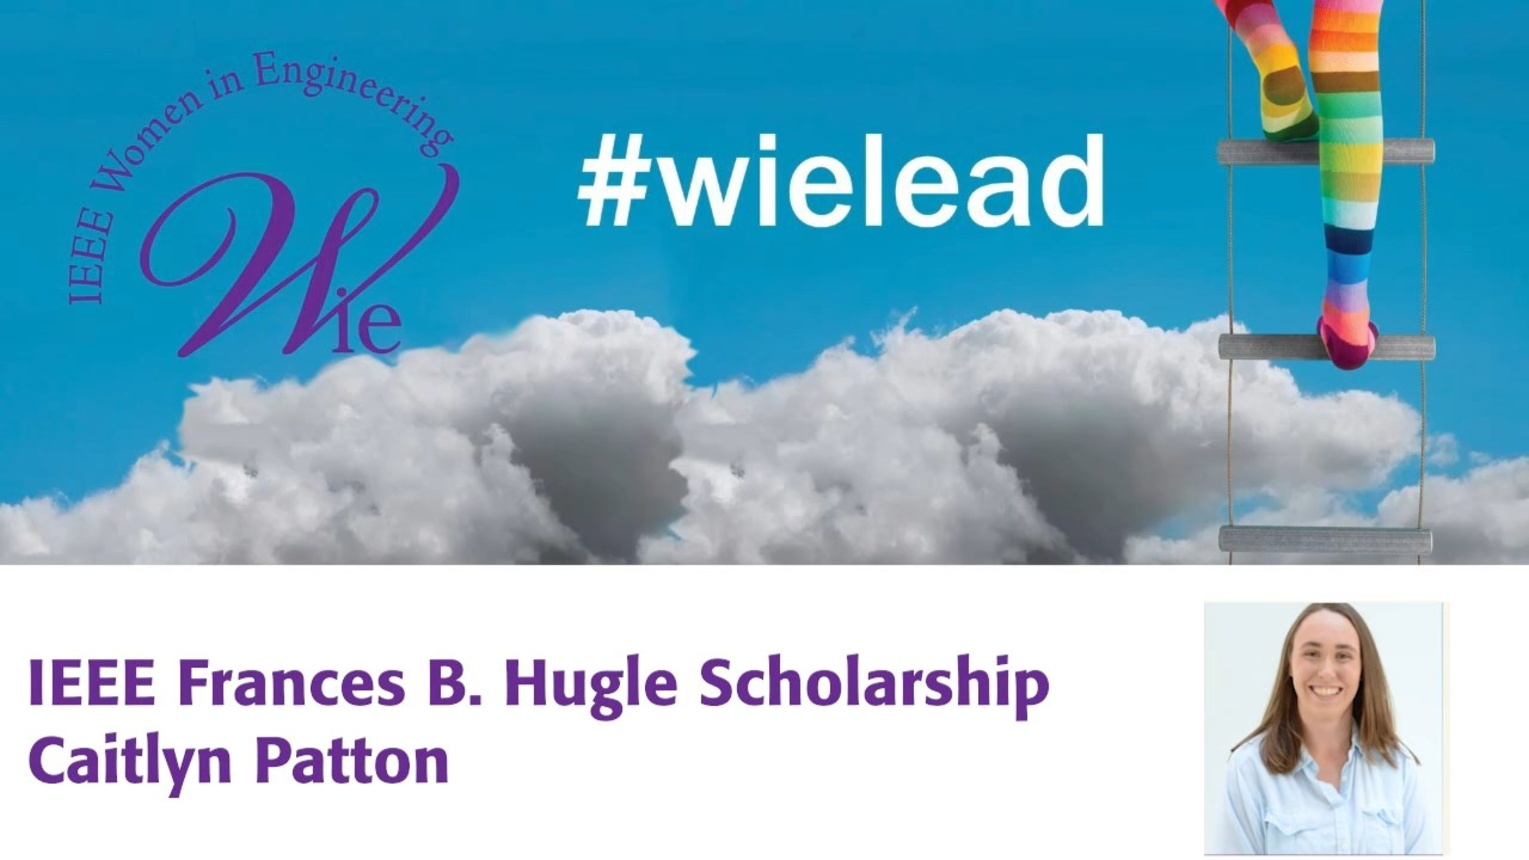 Caitlyn Patton - 2019 IEEE Frances B. Hugle Scholarship Recipient